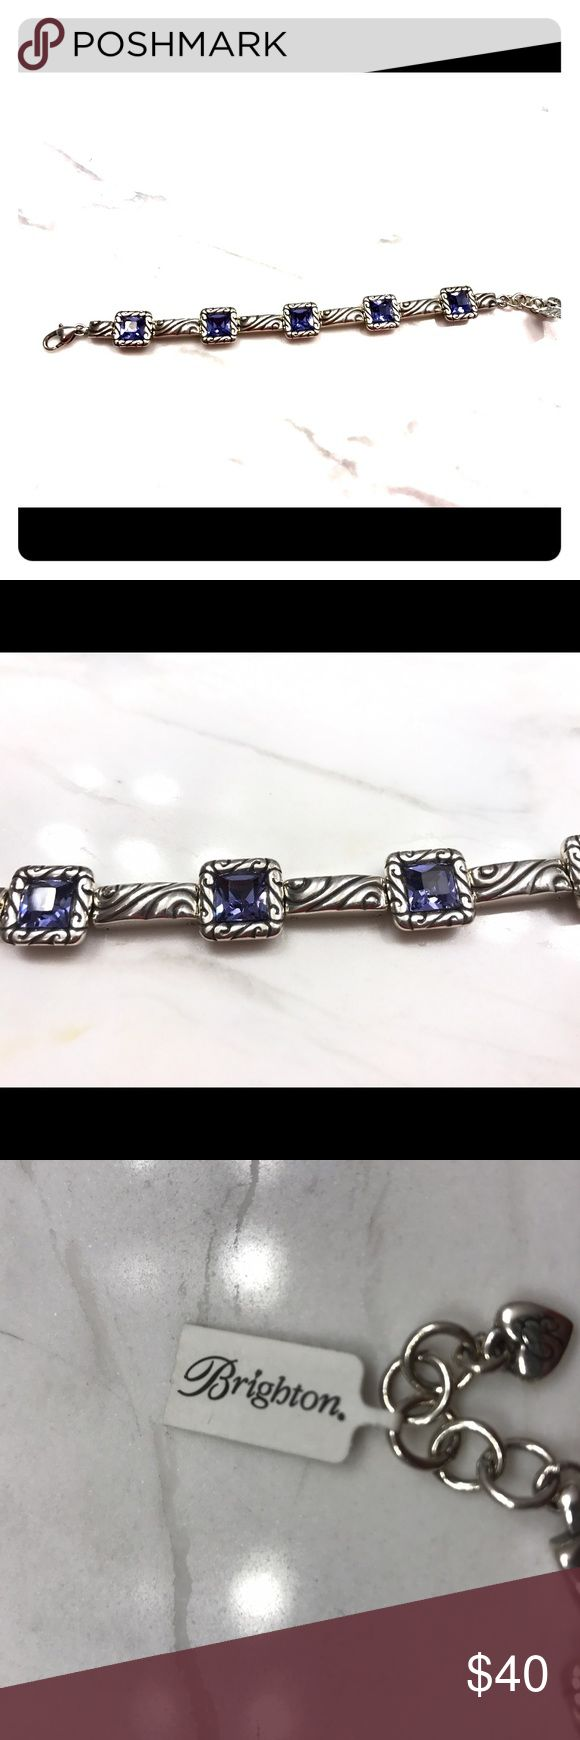 Brighton Bracelet NWT Brighton Bracelet. Amethyst color stone. Brand new. Price negotiable Brighton Jewelry Bracelets